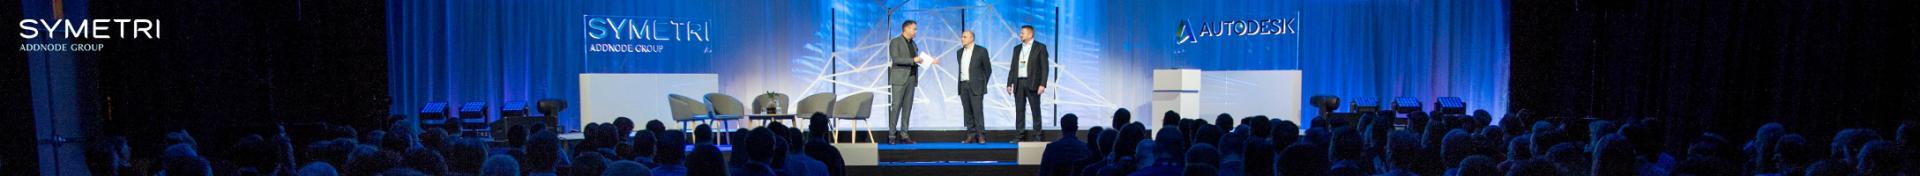 Nordic BIM Summit 2020, Presented by Symetri